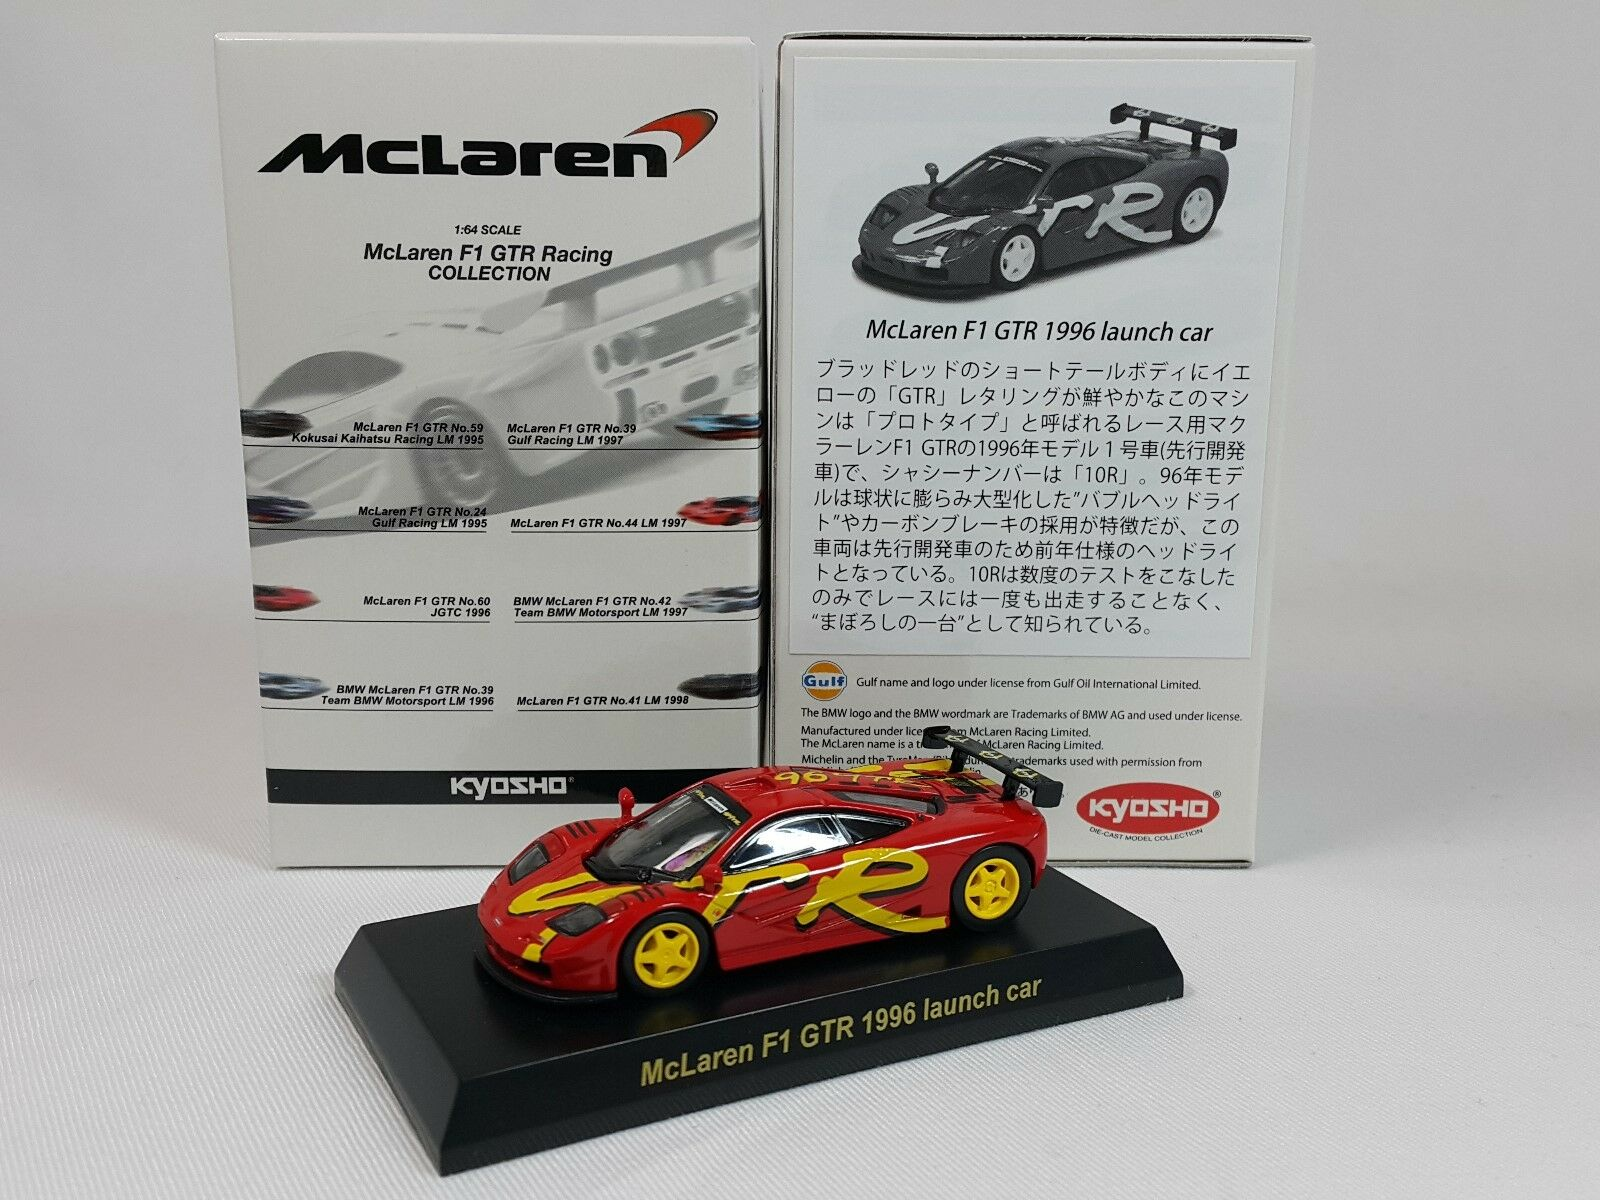 saludable 1 64 64 64 Kyosho McLaren MiniCoche Racing Collection F1 GTR 1996 lanzamiento coche karuwaza se  venta mundialmente famosa en línea